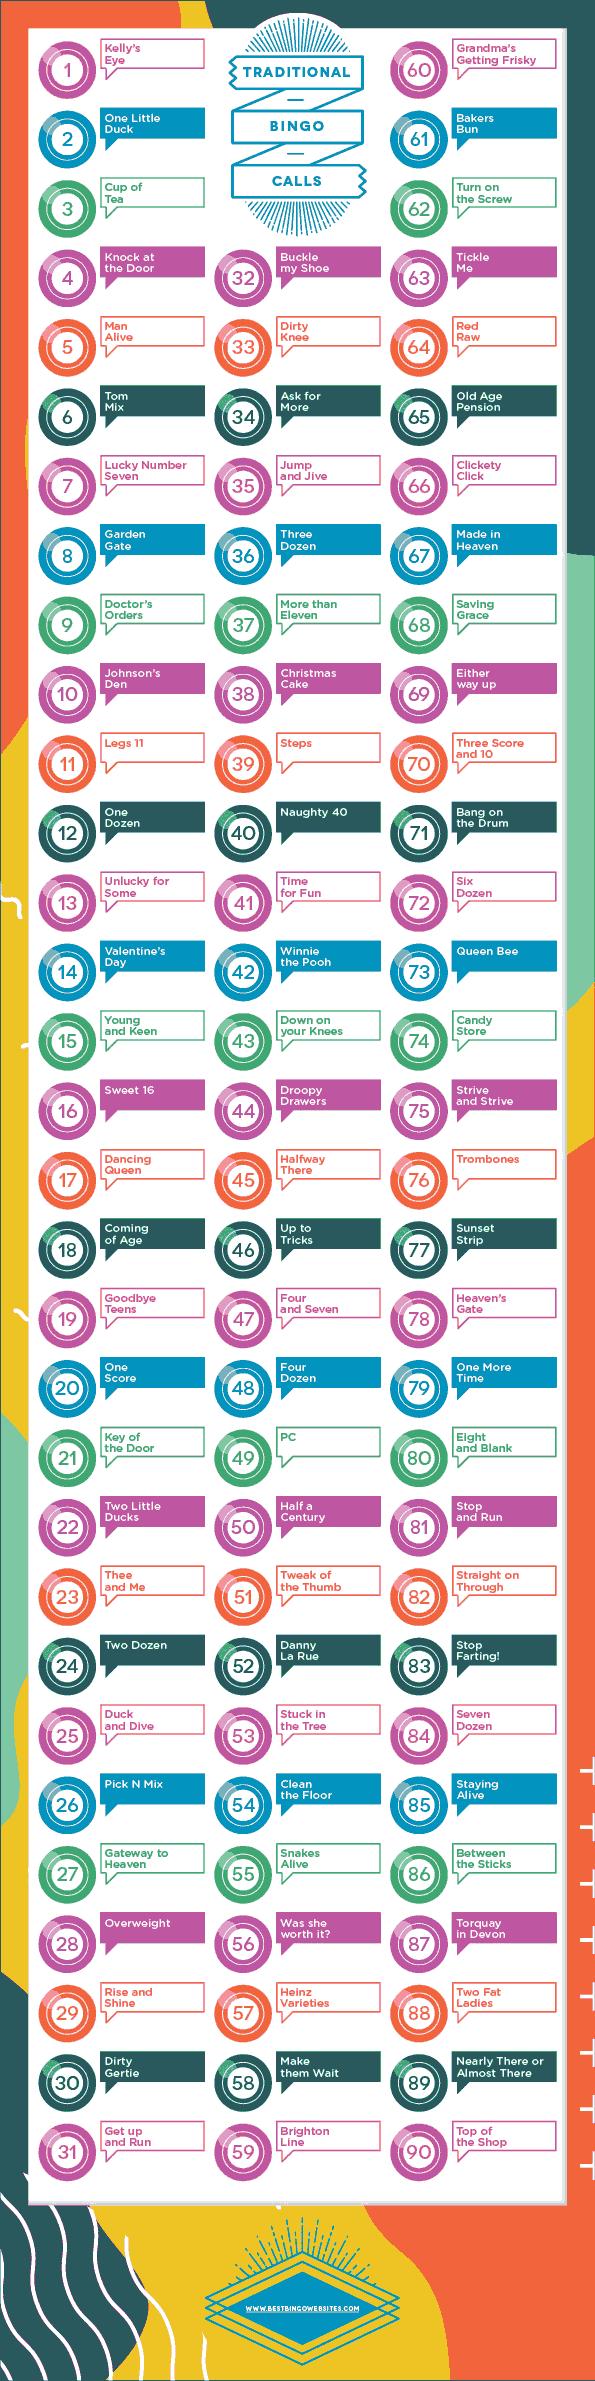 50 best bingo sites for usa players